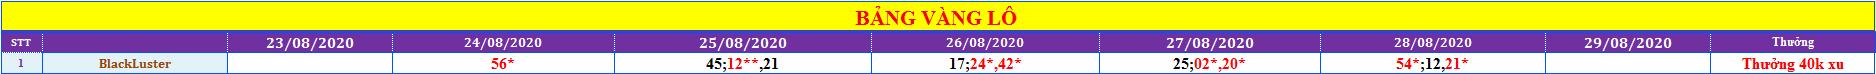 thuong vip3.png